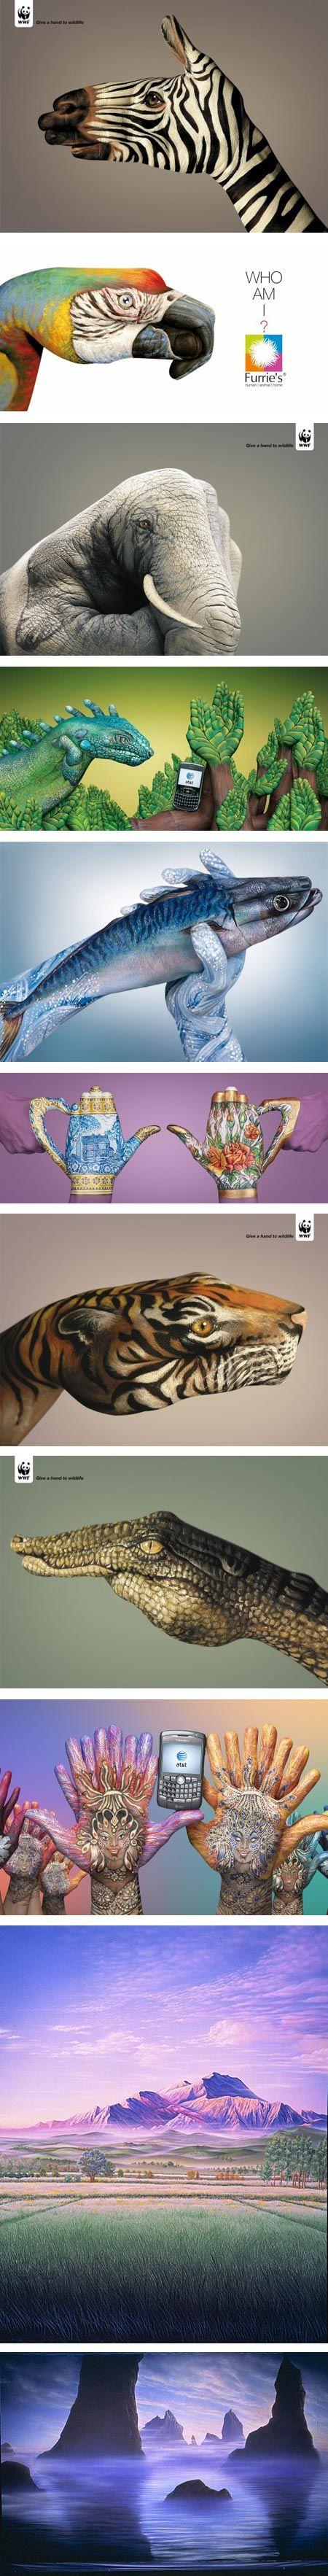 Handimals by Guido Daniele - Milan based illustrator